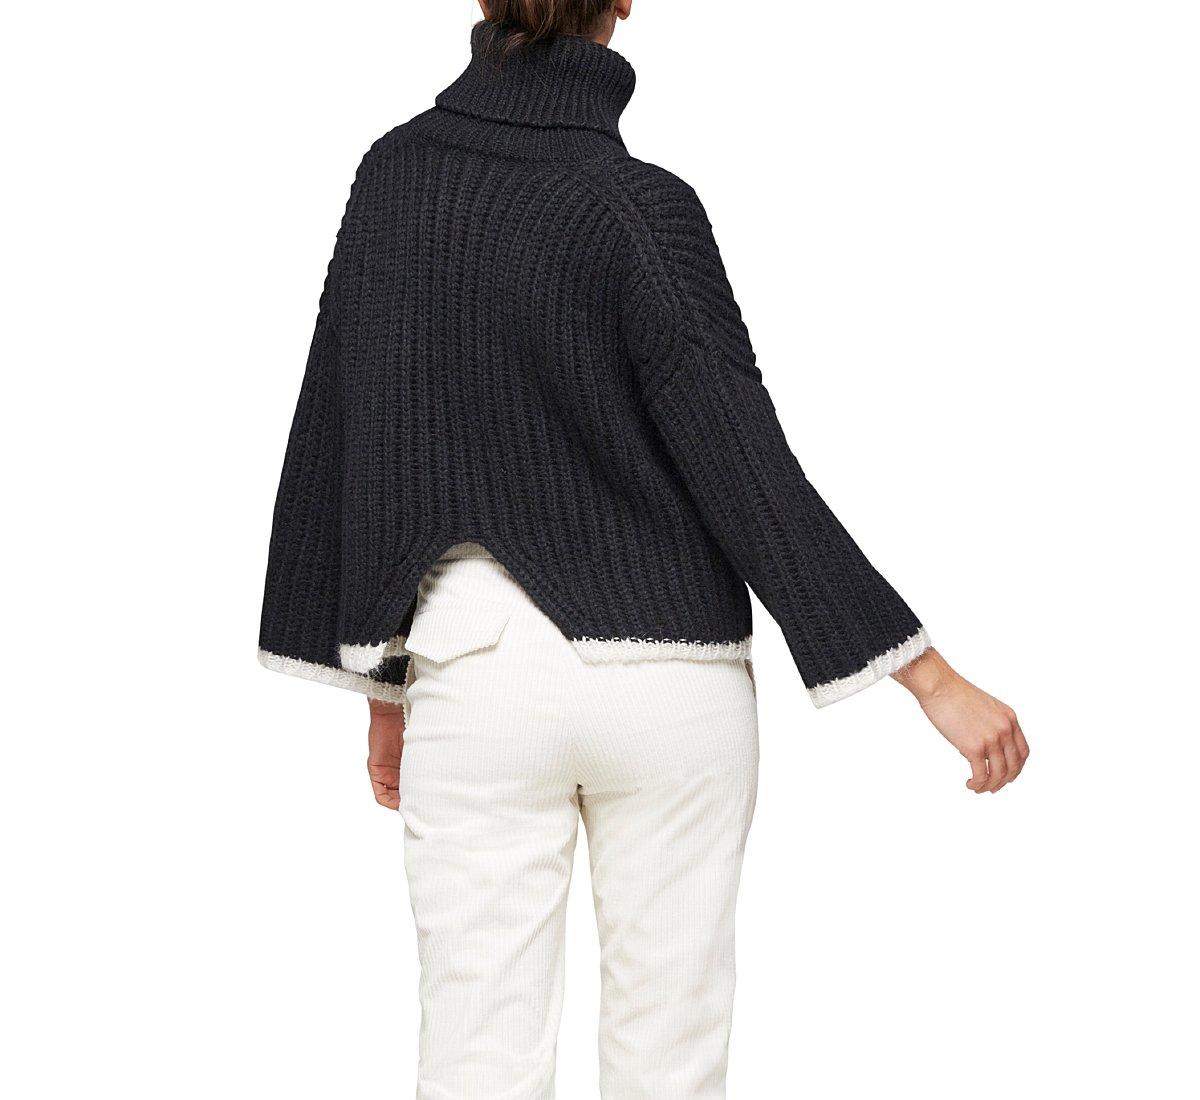 Cropped turtleneck sweater with brioche stitch